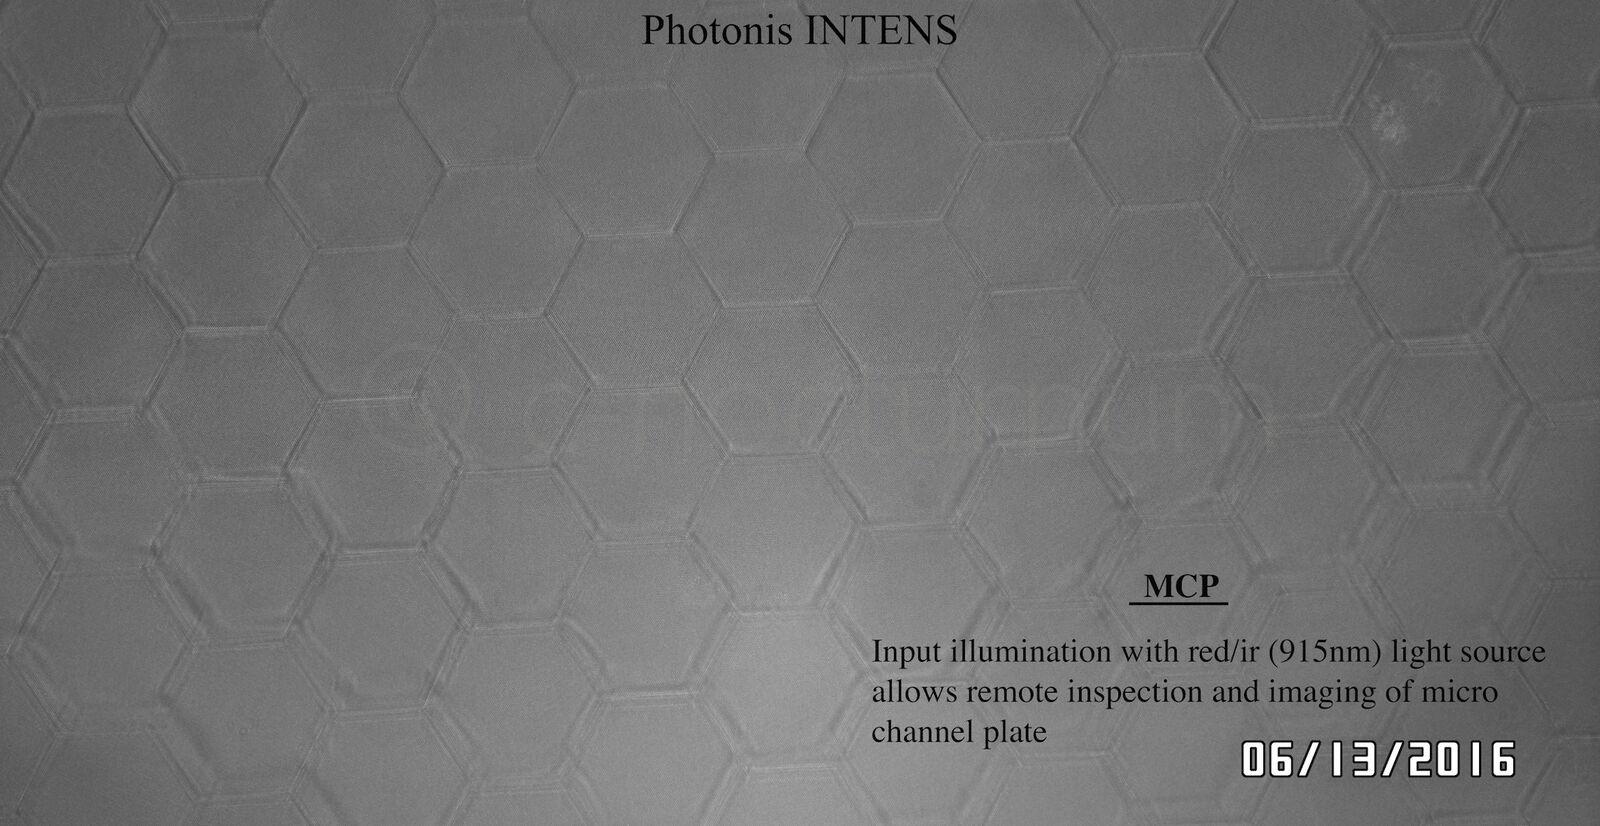 Photonis 4G INTENS MCP